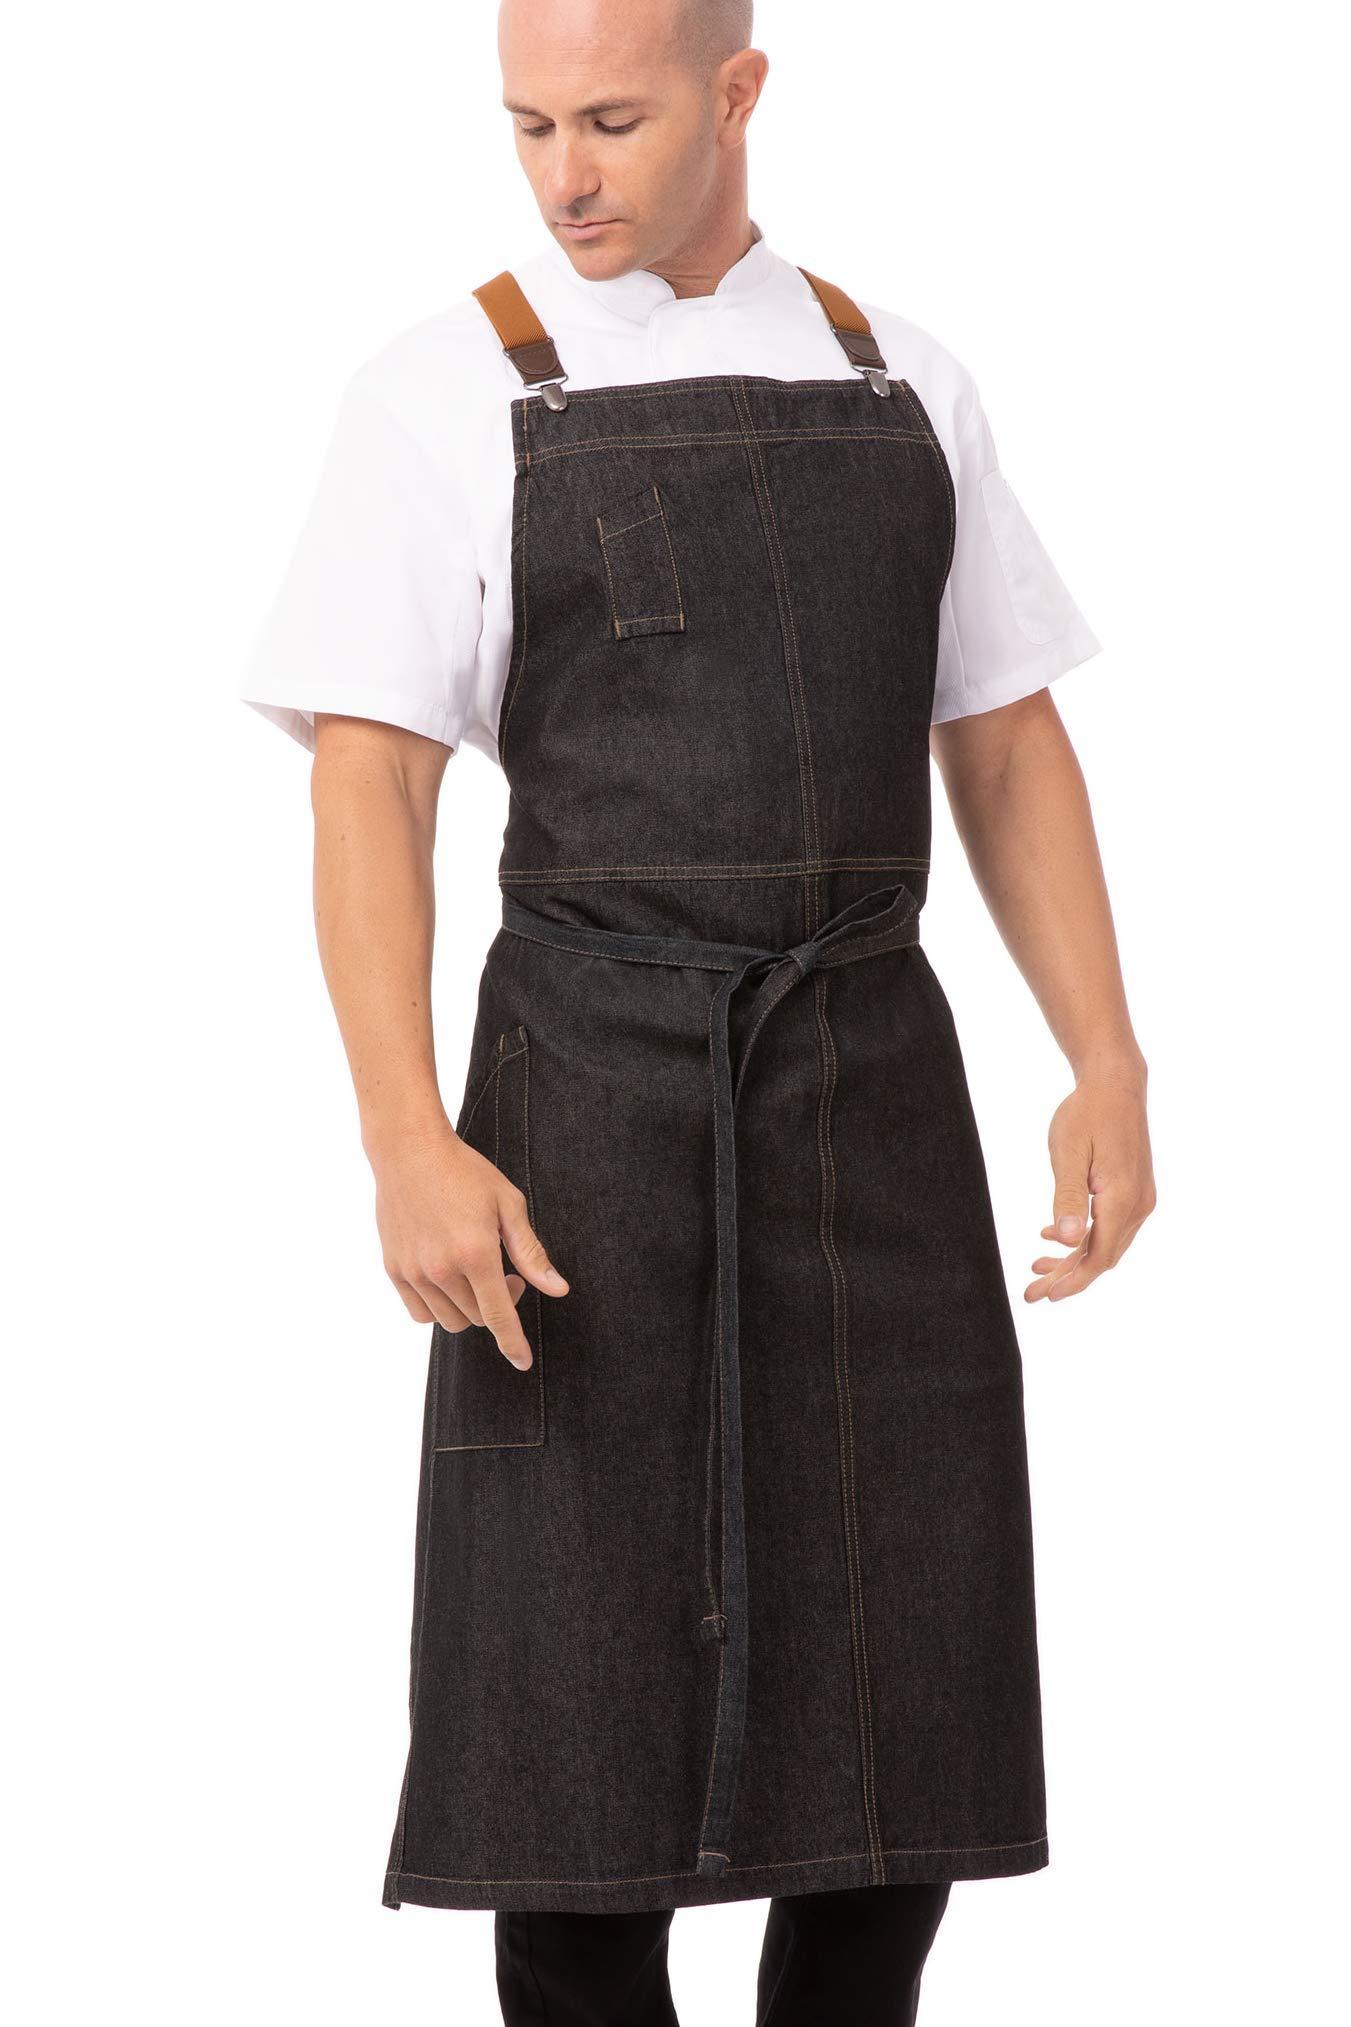 Chef Works Men's Berkeley Chefs Bib Apron, Black, One Size by Chef Works